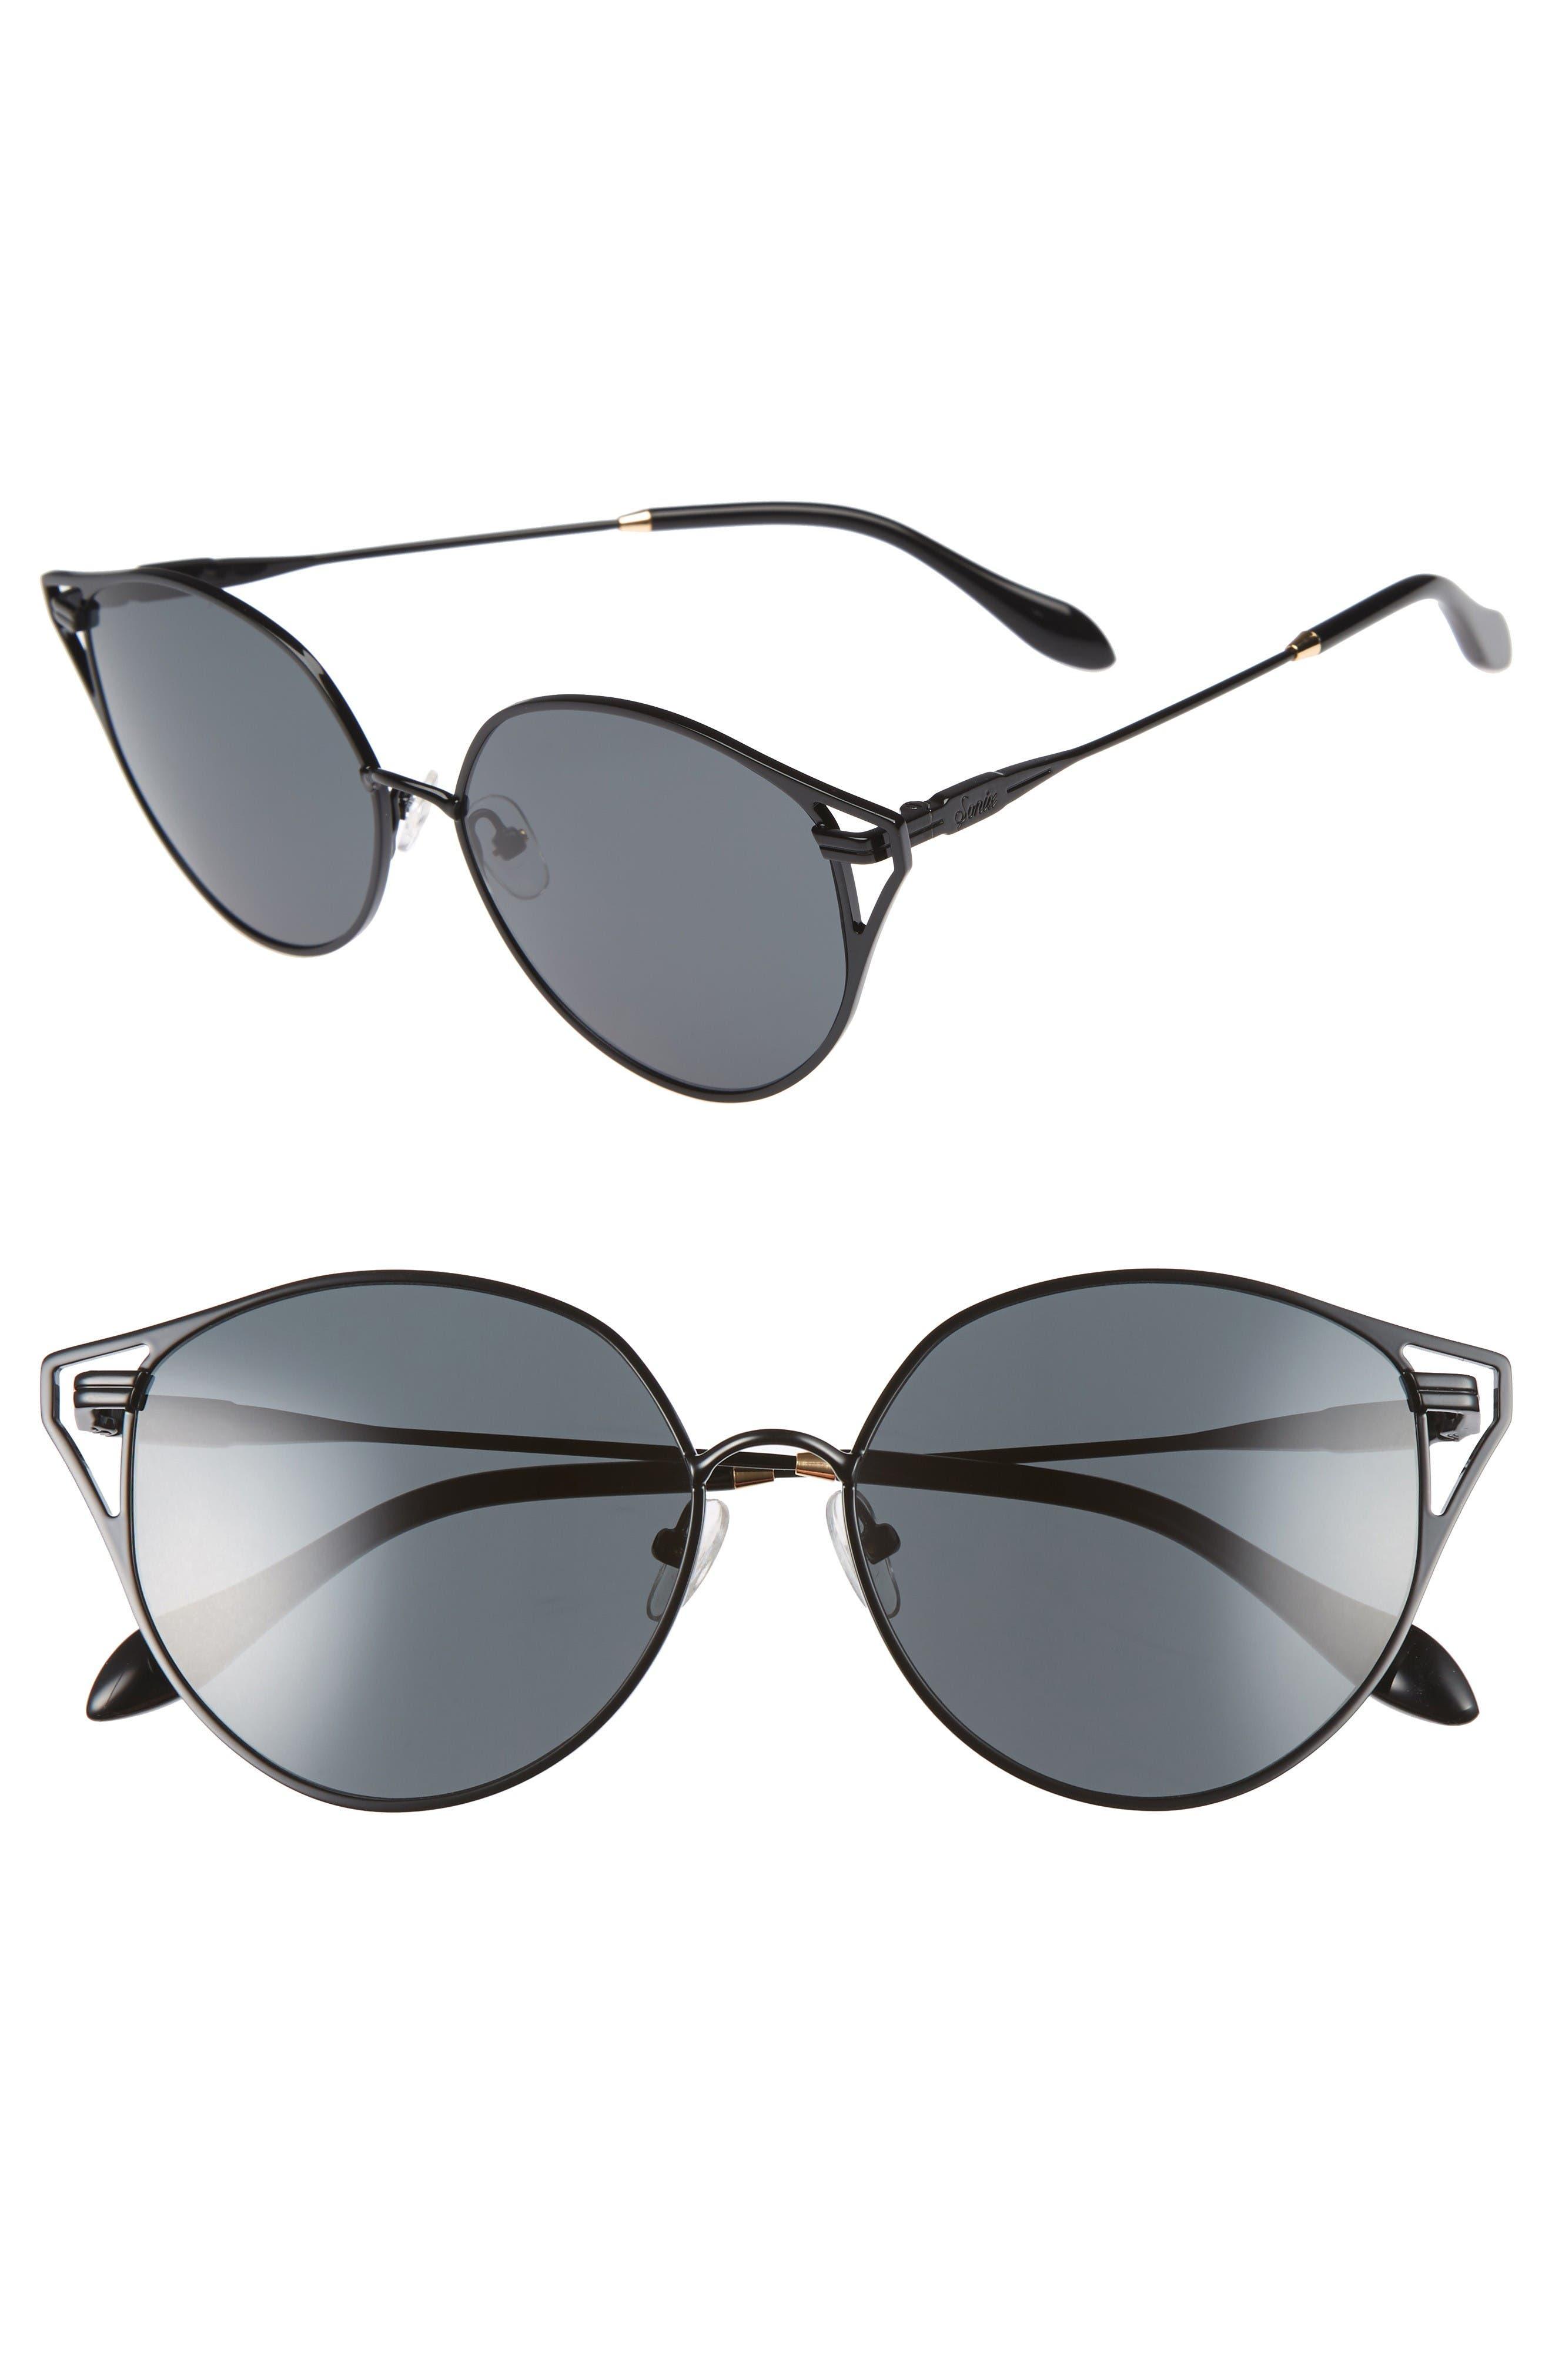 Sonix Ibiza 55mm Cat Eye Sunglasses